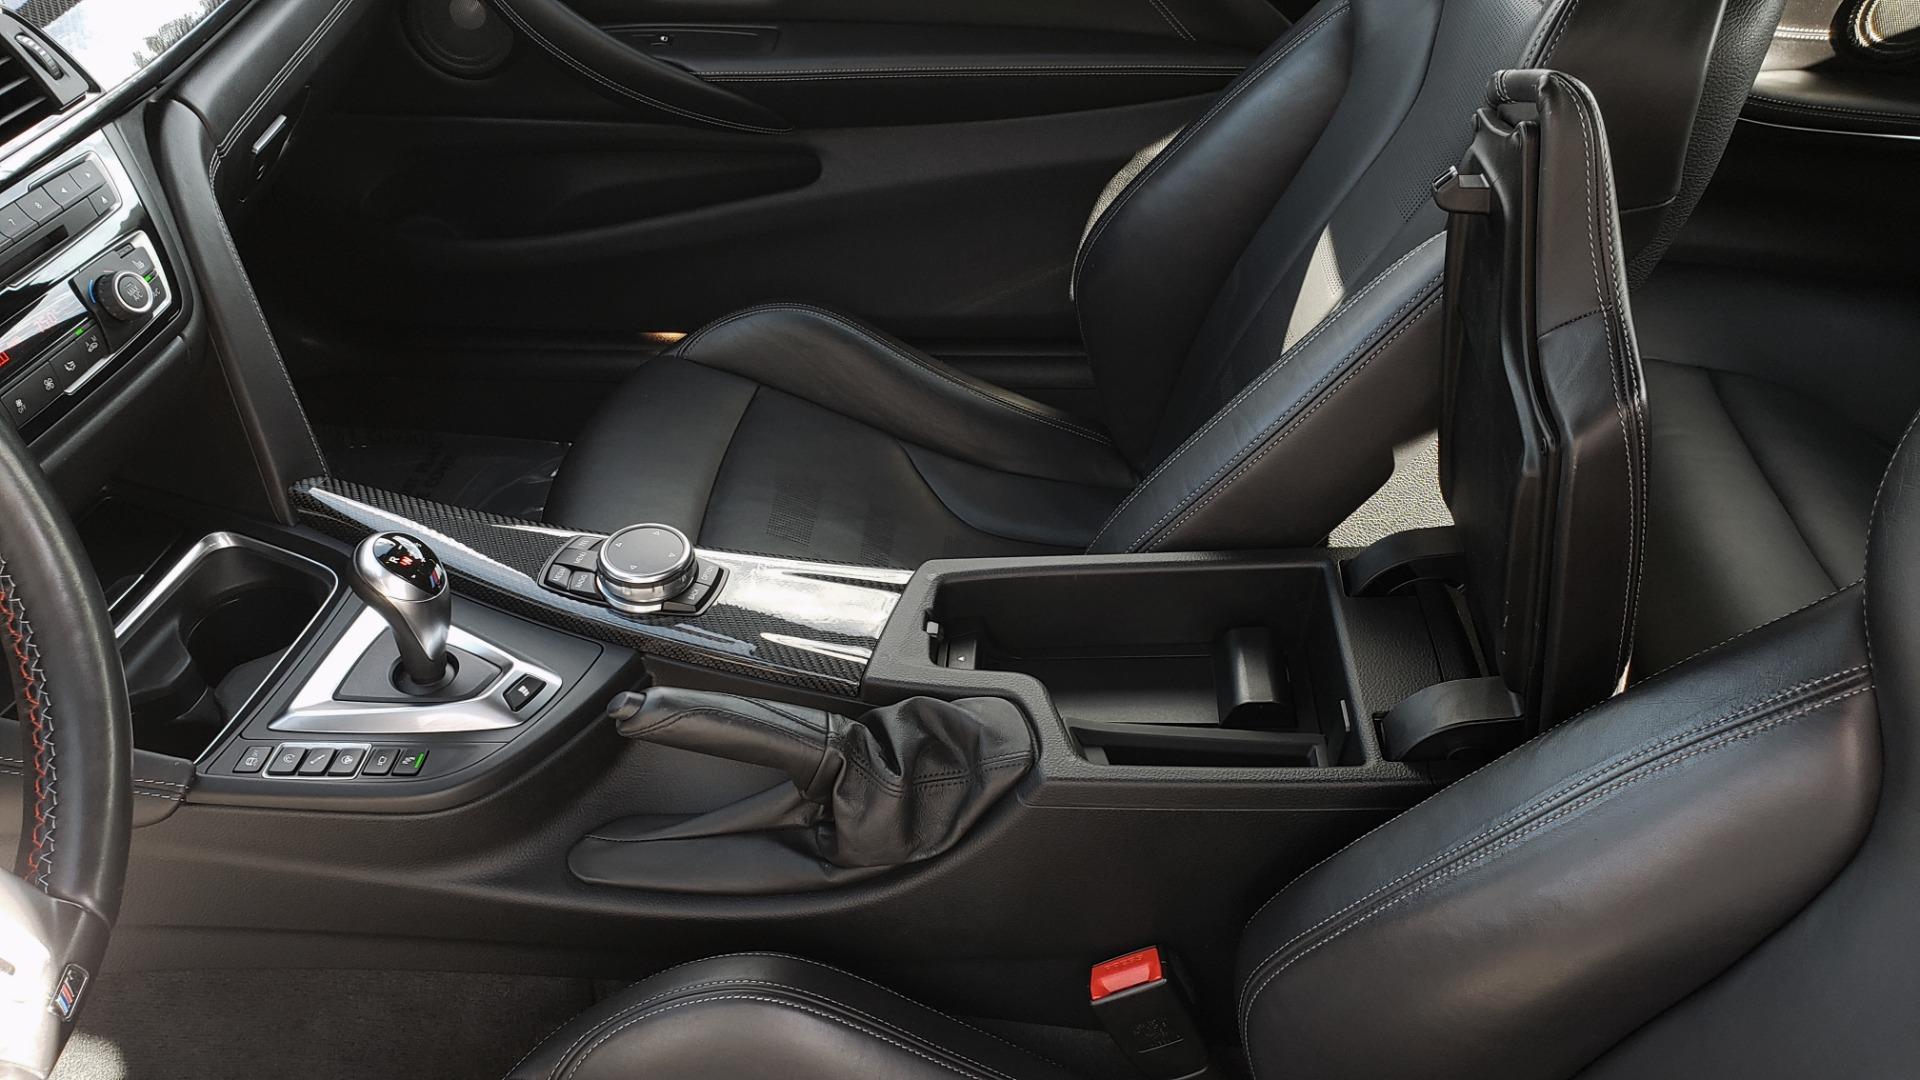 Used 2015 BMW M4 COUPE / EXEC PKG / DRVR ASST PLUS / LIGHTING / M-SUSPENSION for sale Sold at Formula Imports in Charlotte NC 28227 65